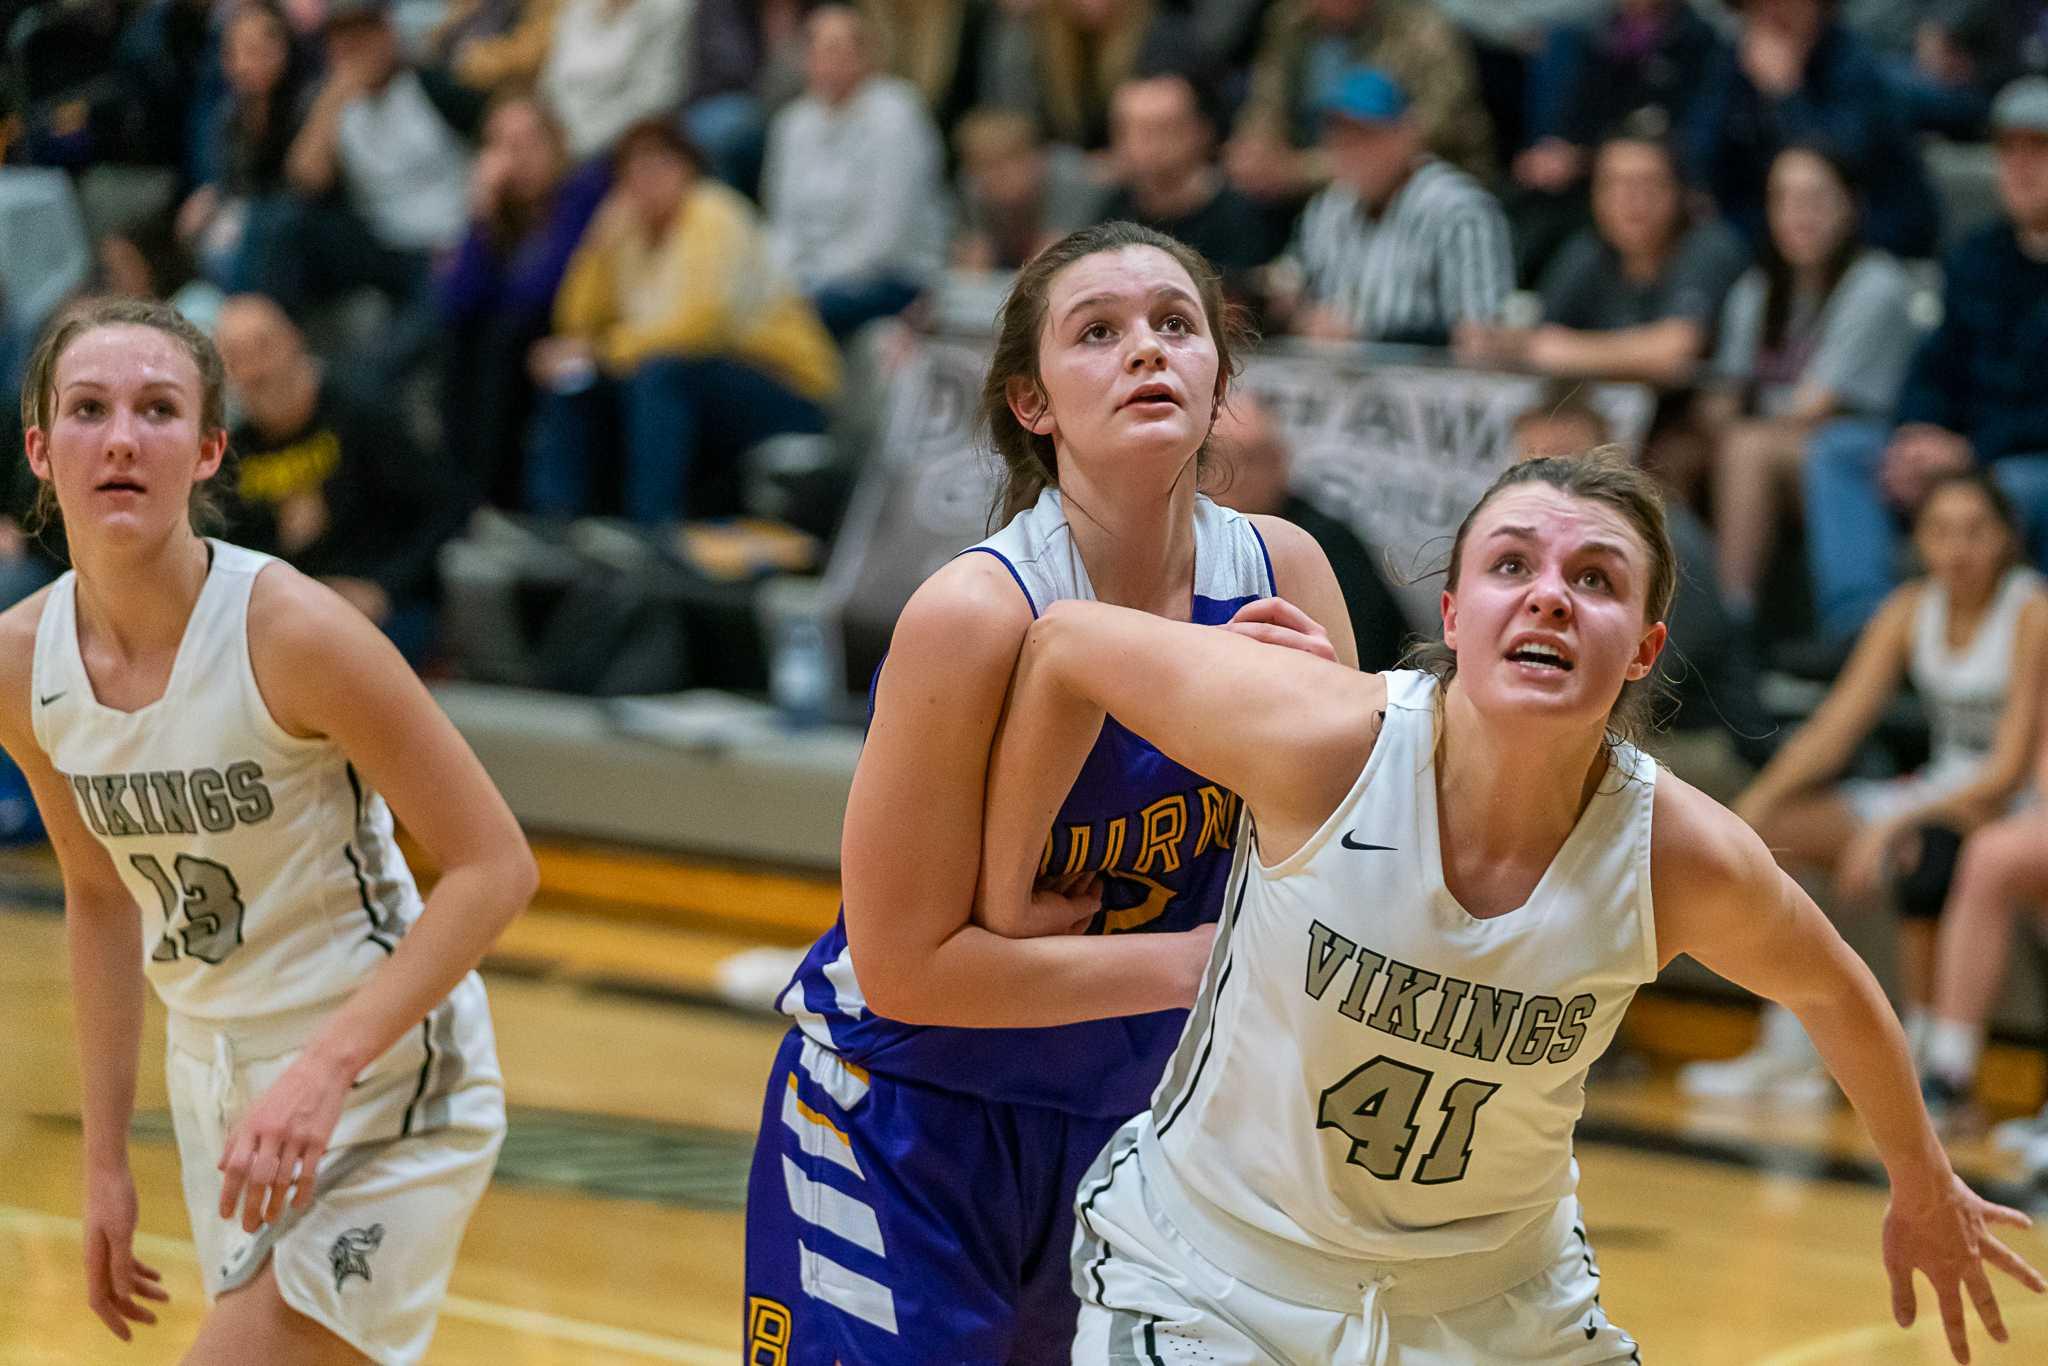 Vale's Kailey McGourty blocks out Burns' Allie Hueckman on Saturday. (Randy Seals/Eastern Oregon Sports Photos)